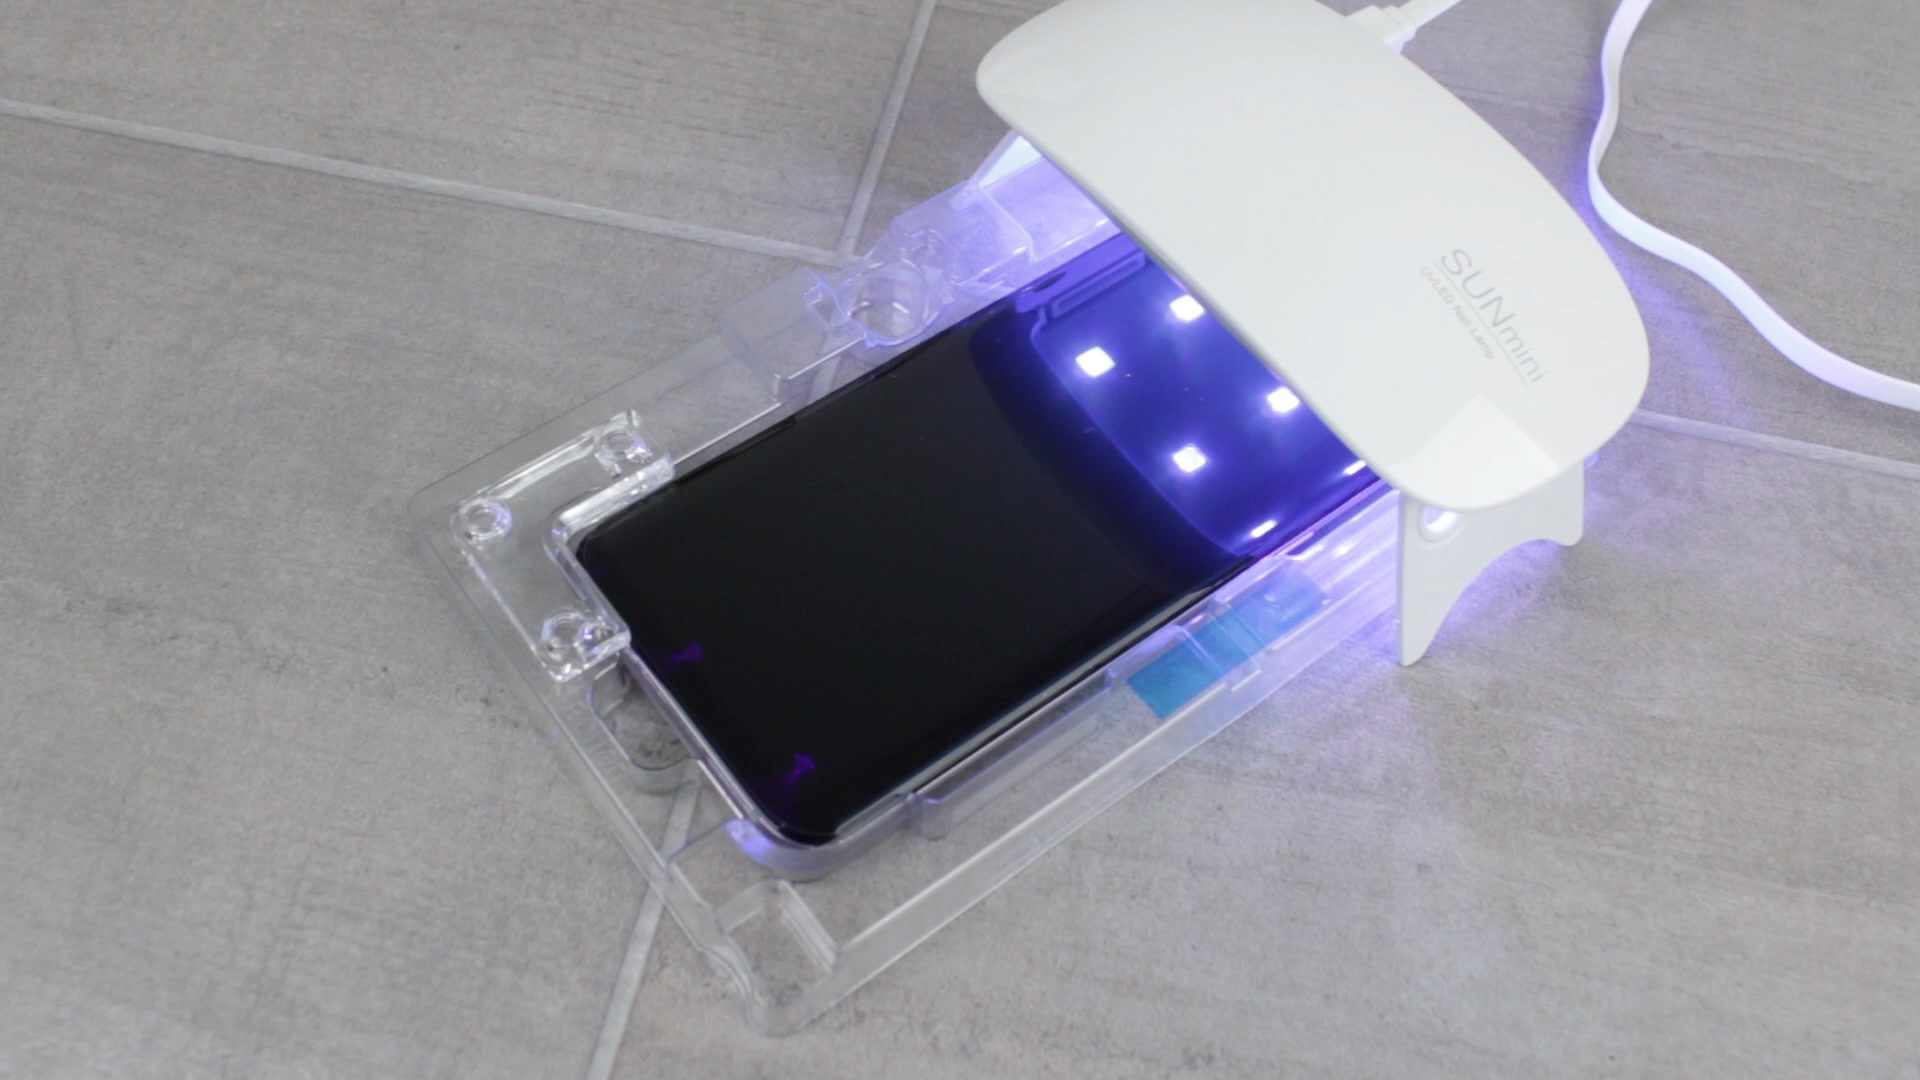 How To Install Whitestone Screen Protector Mobile Fun Blog